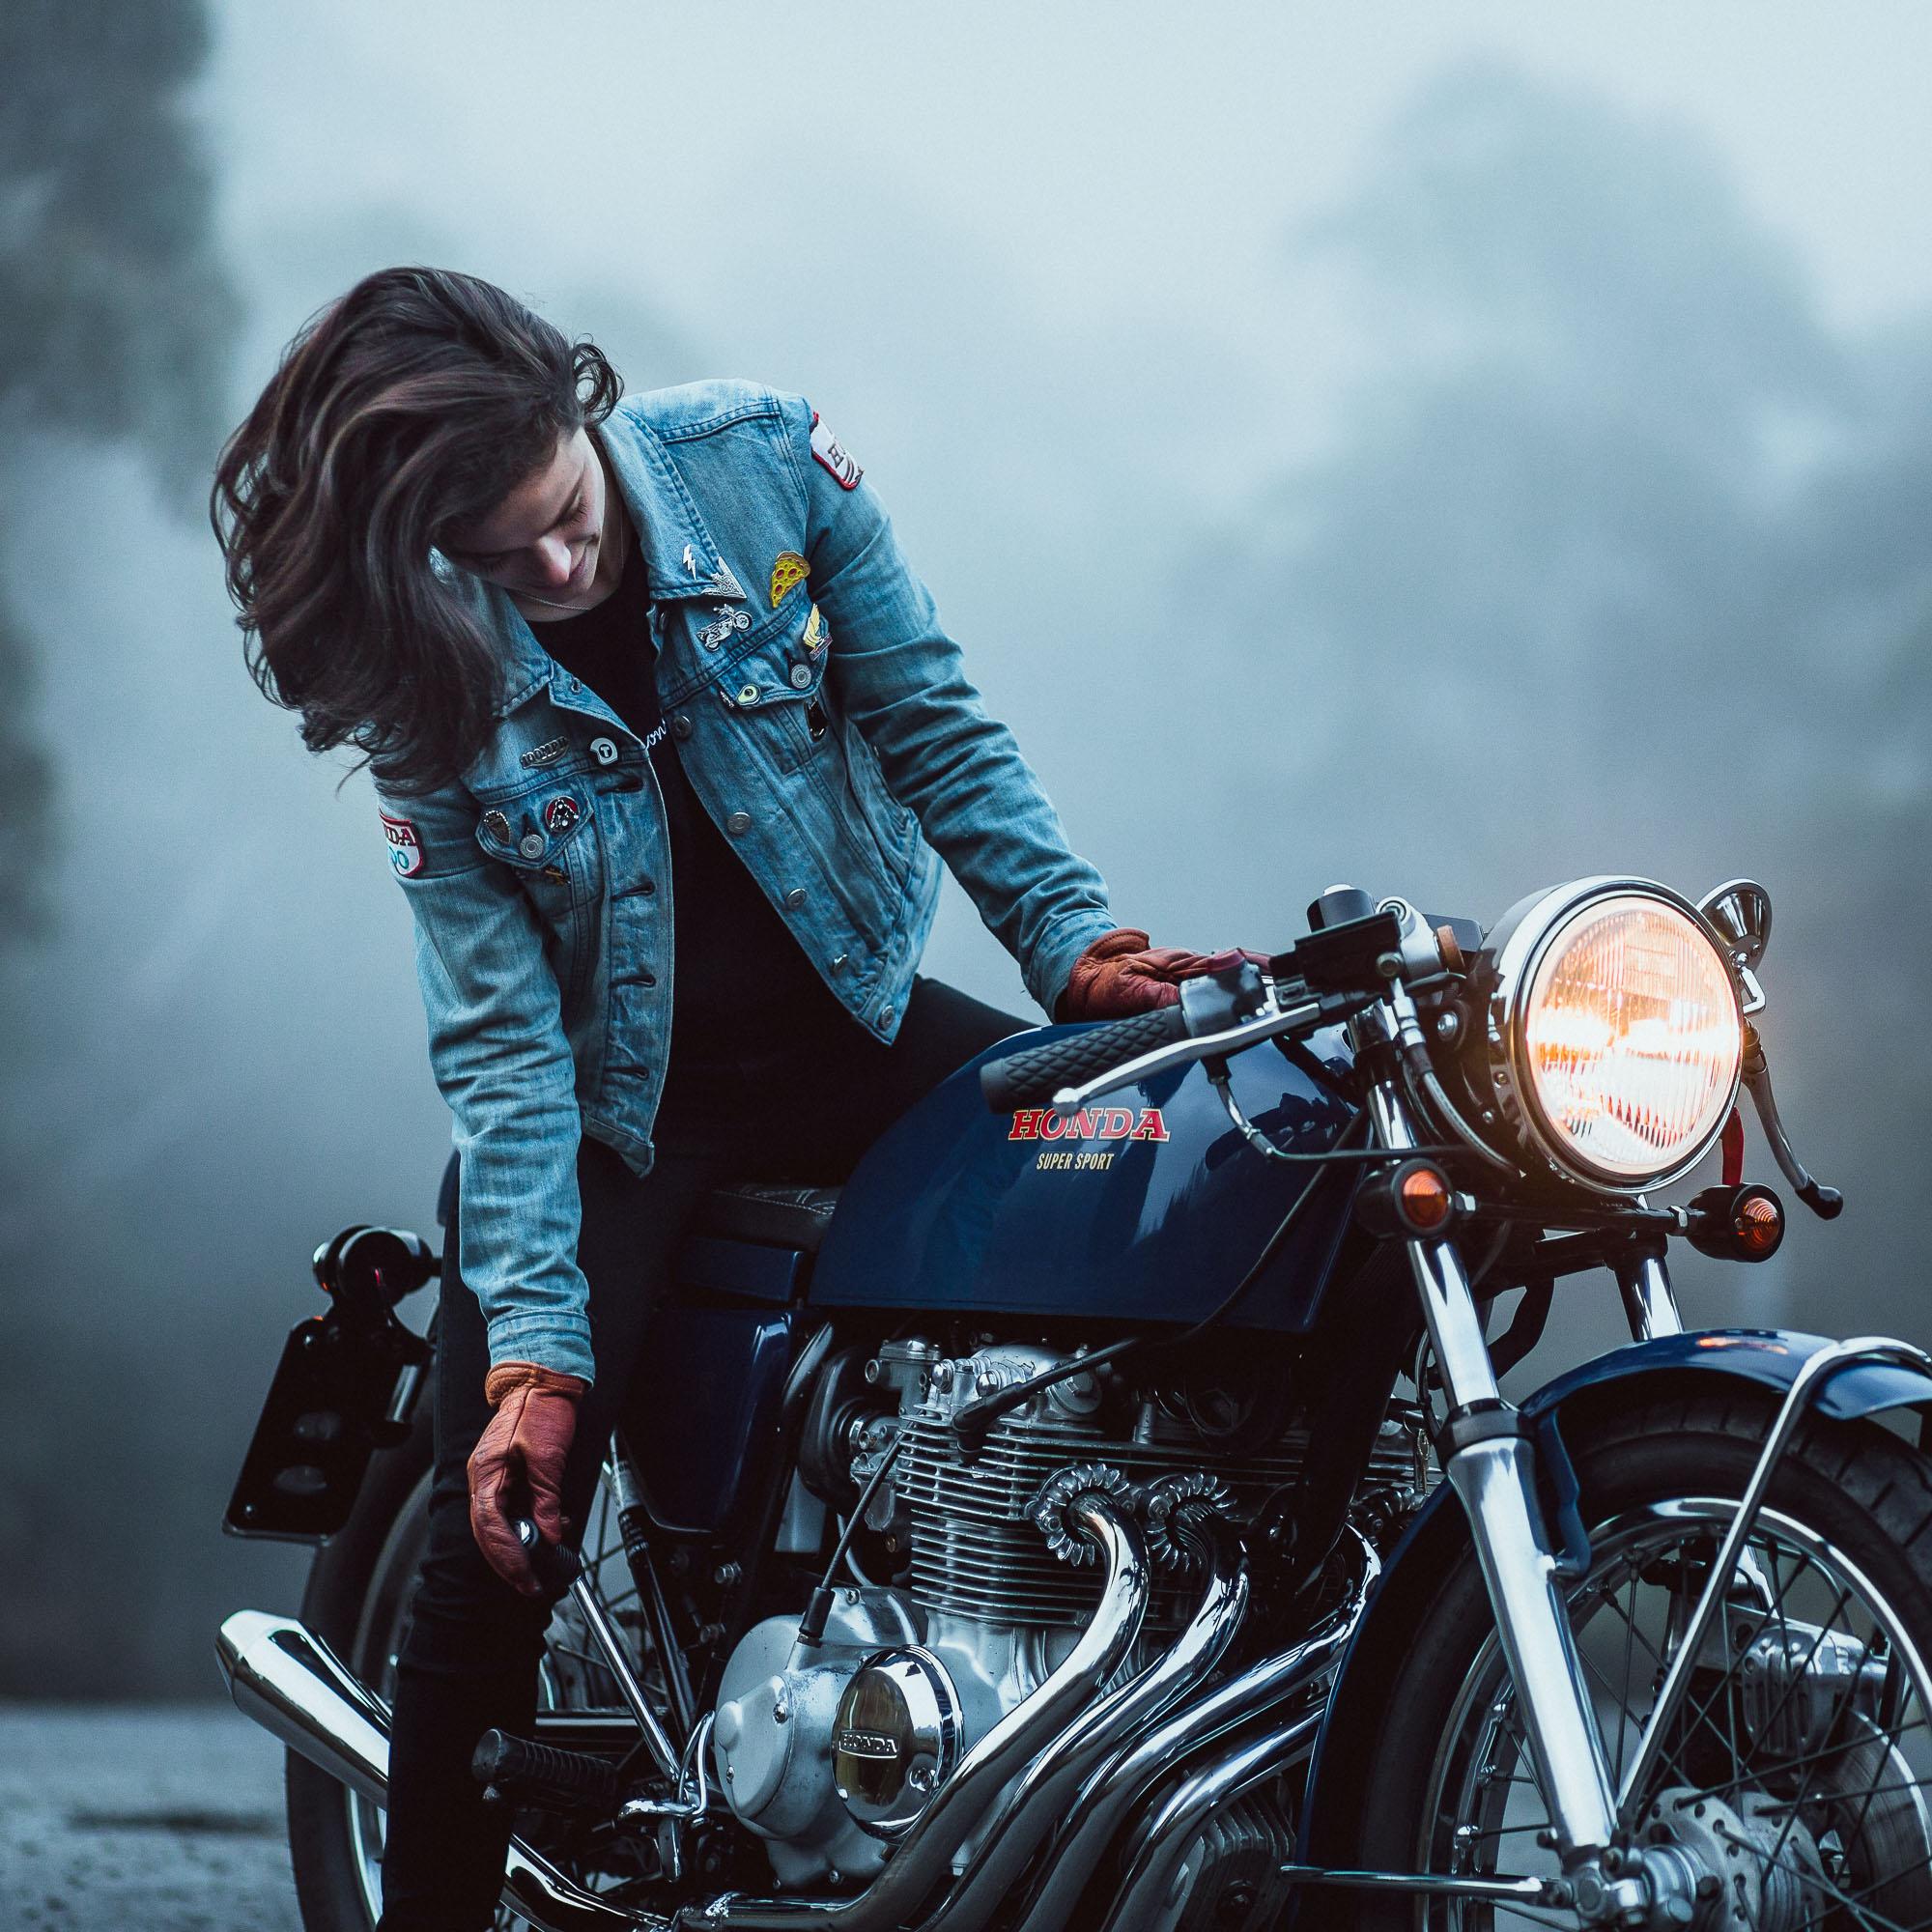 Katie Abdilla in Tasmania seated on her Honda CB400 Four Motorcycle